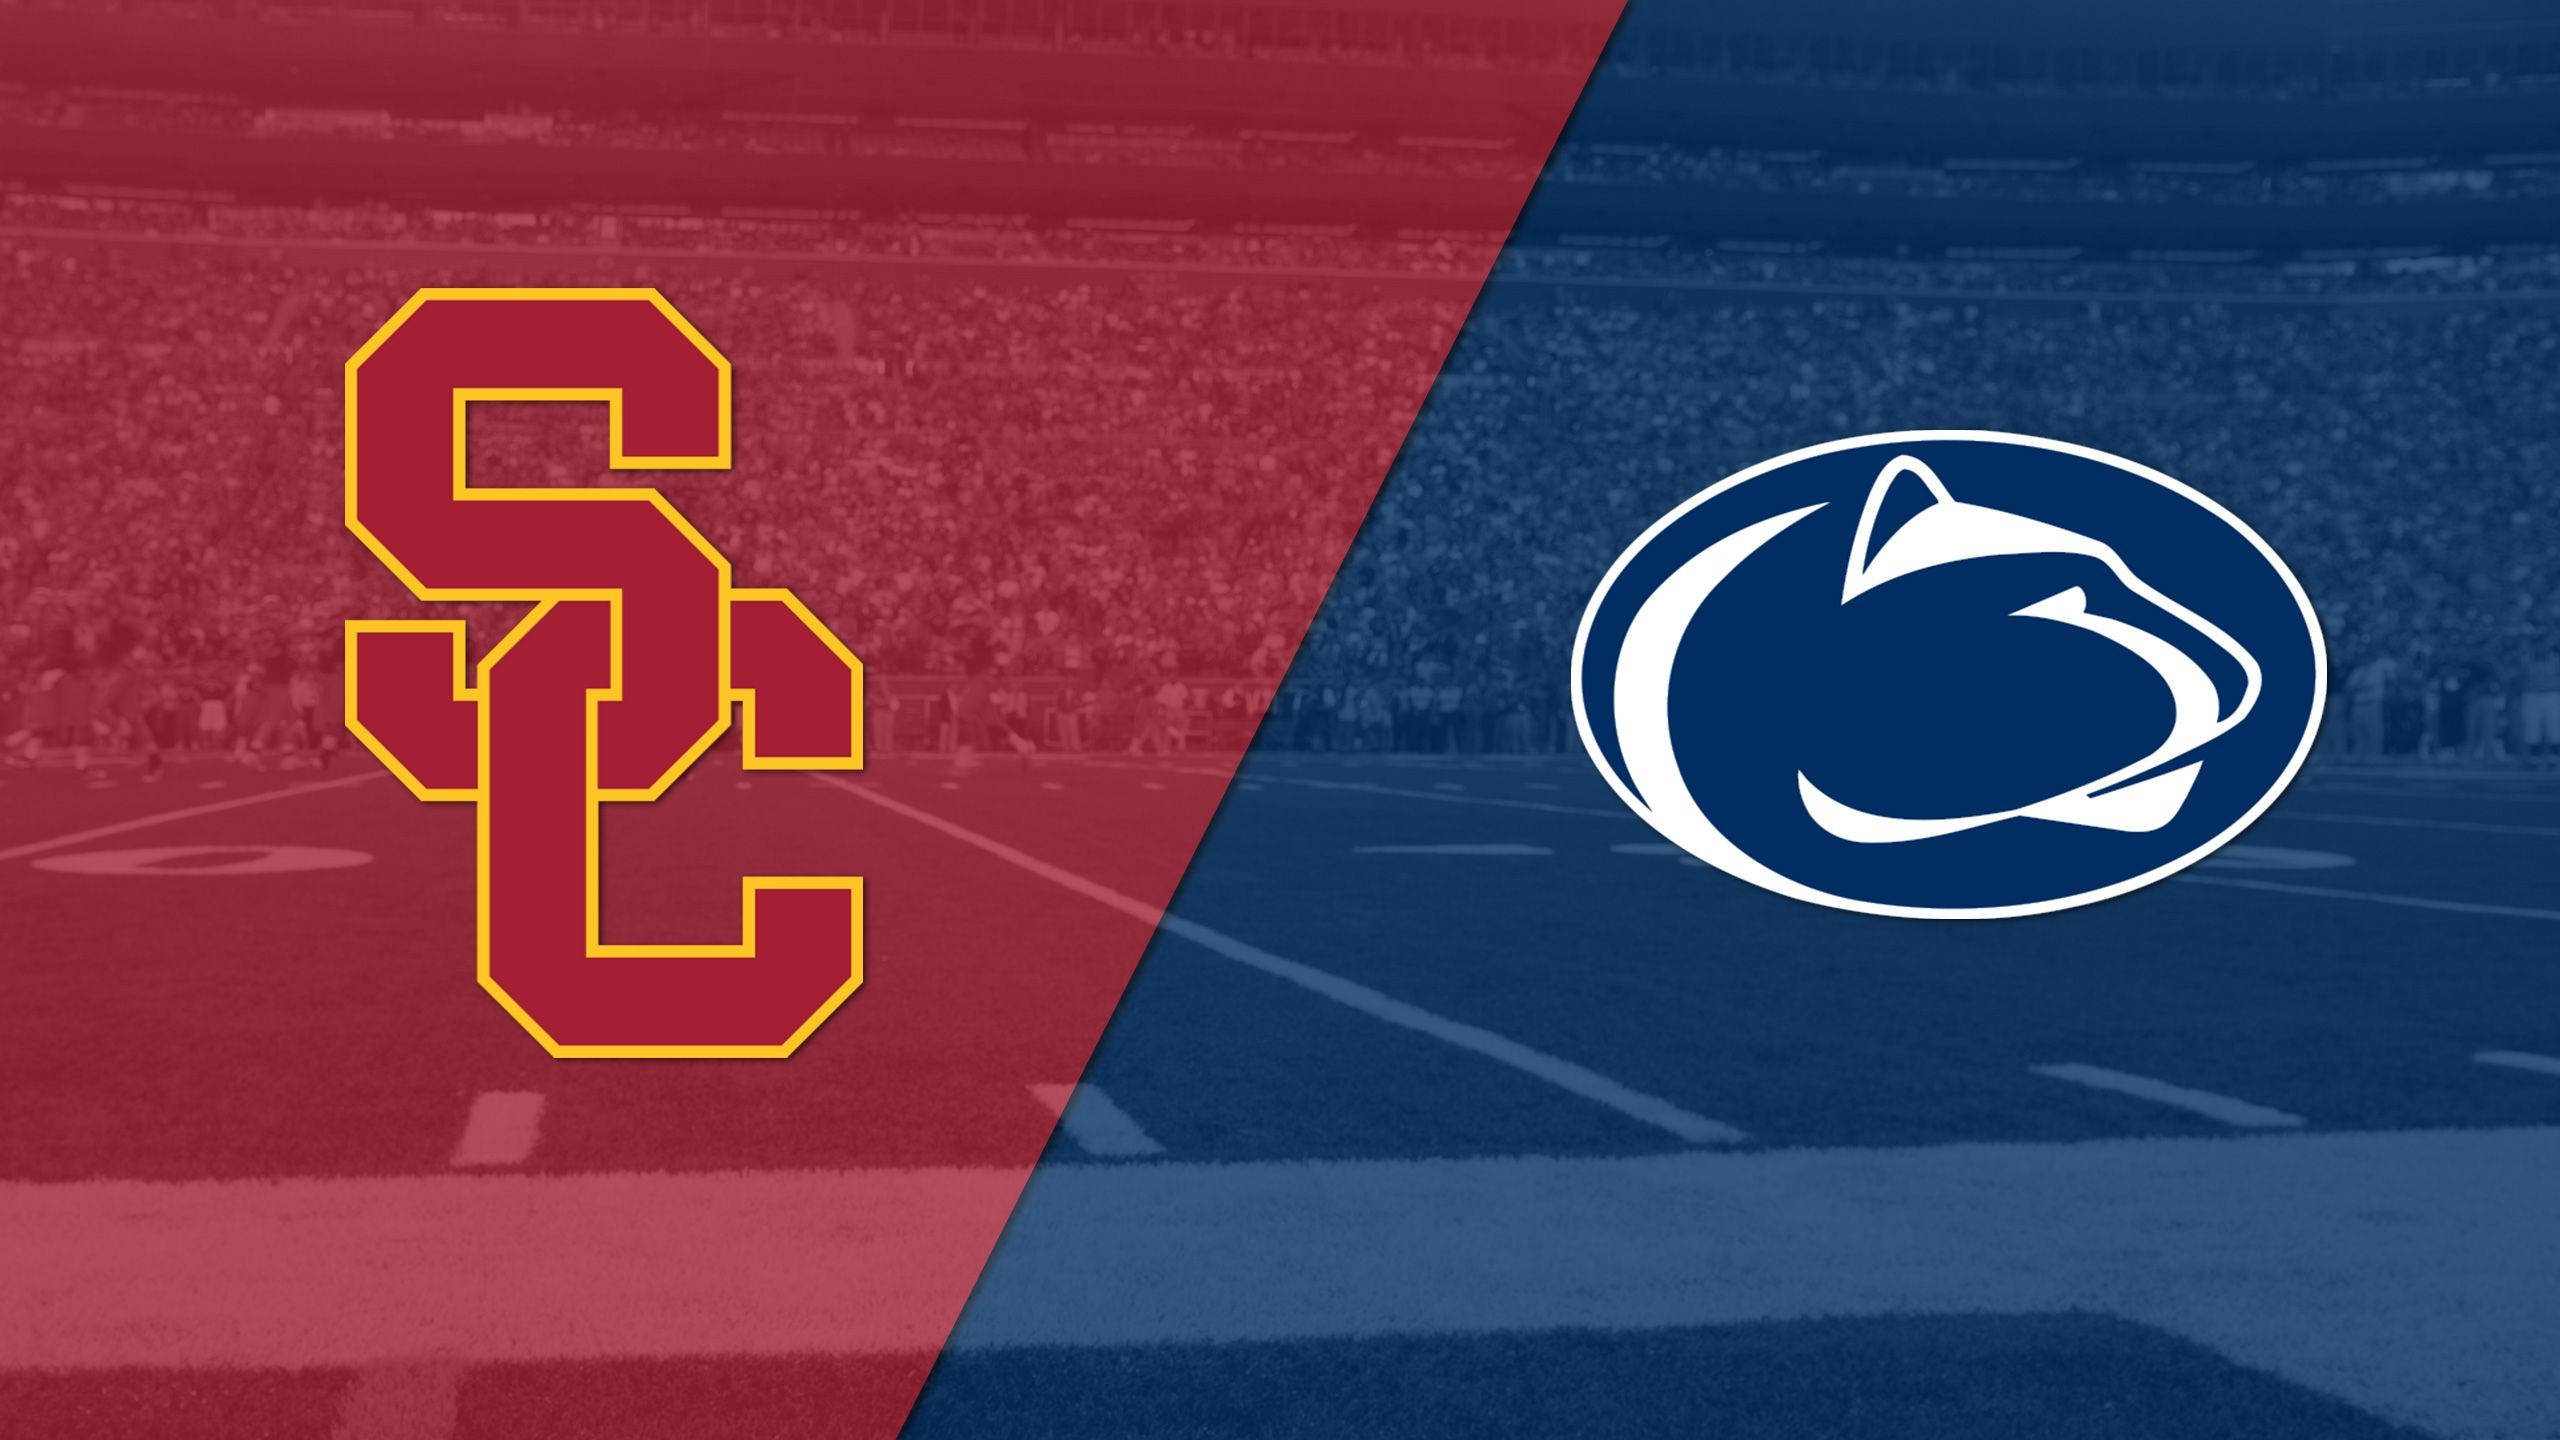 #9 USC vs. #5 Penn State (Football) (re-air)